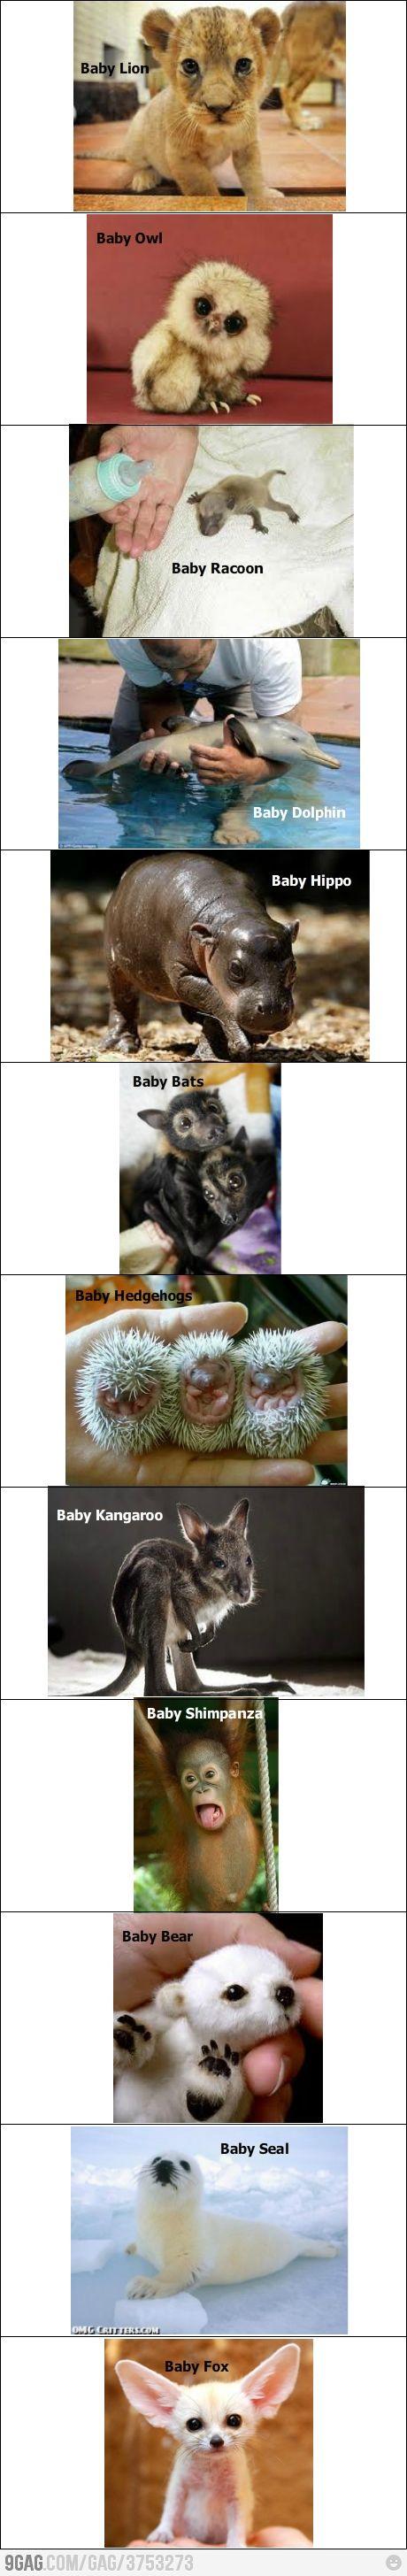 Baby animals! Lion, Owl, Raccoon, Dolphin, Hippo, Bats, Hedgehogs, Kangaroo, Shimpanza, Bear, Seal, Fox. Very cute!